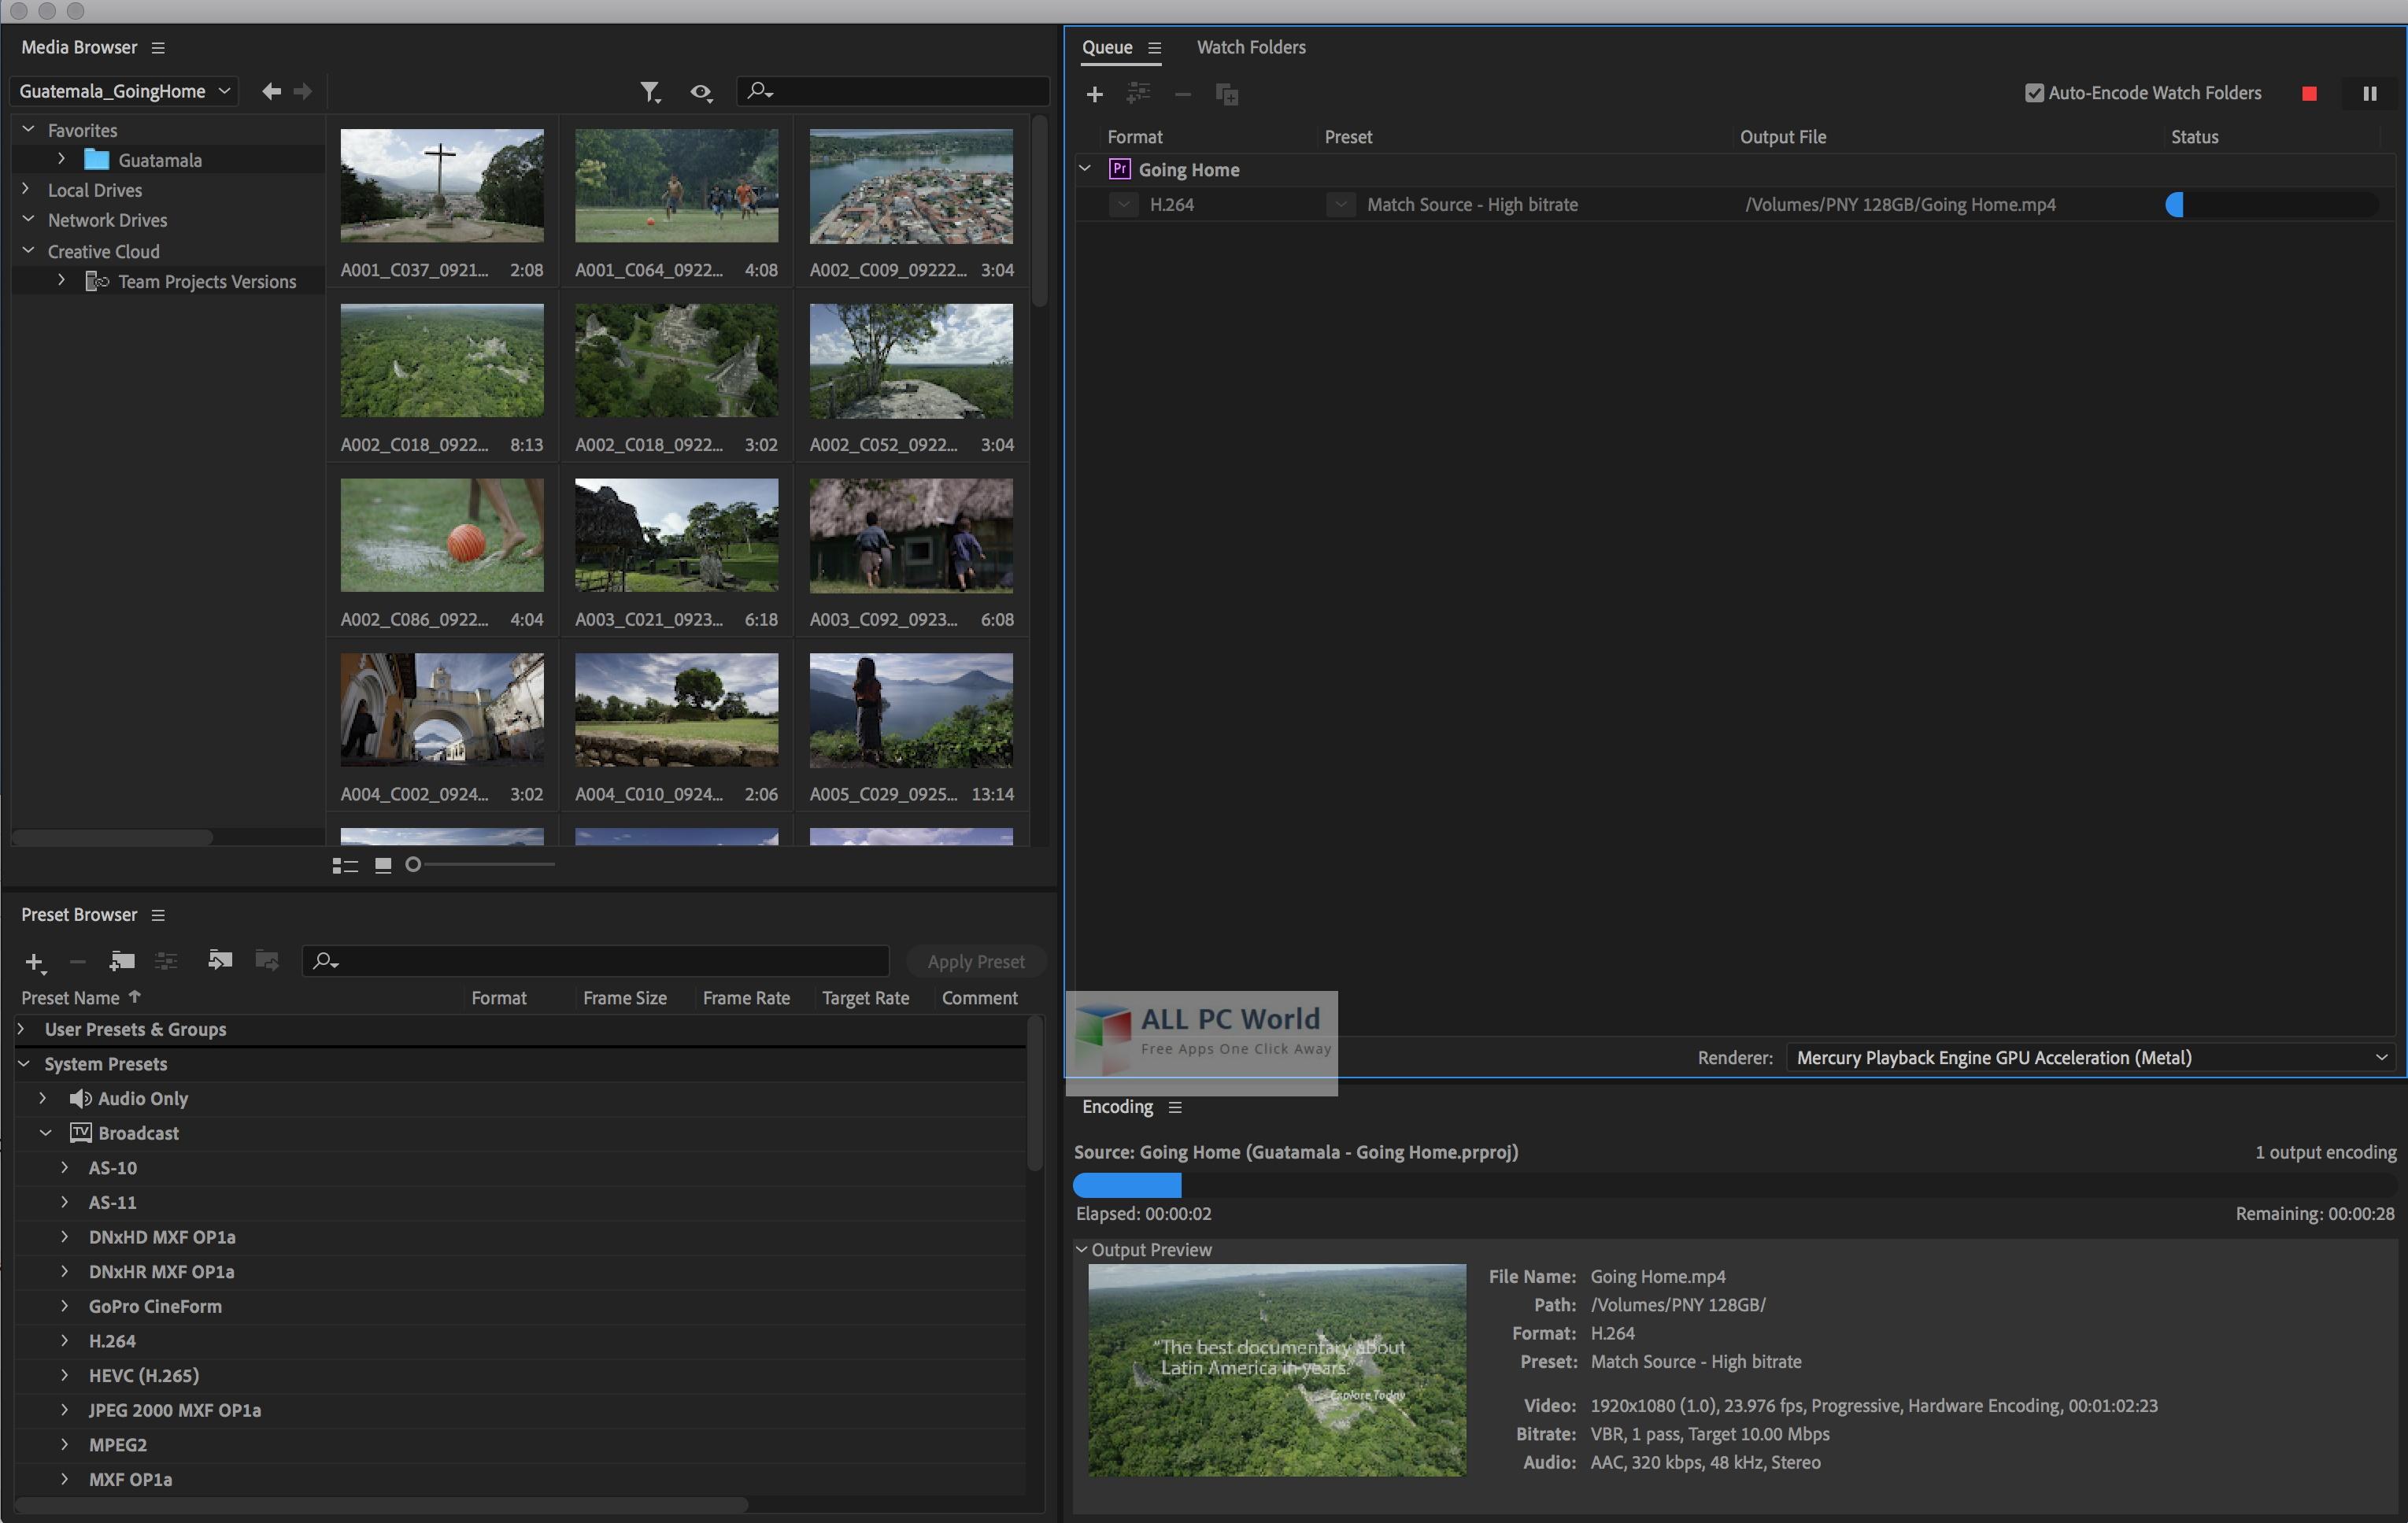 Adobe Media Encoder CC 2020 v14.0.4 Download